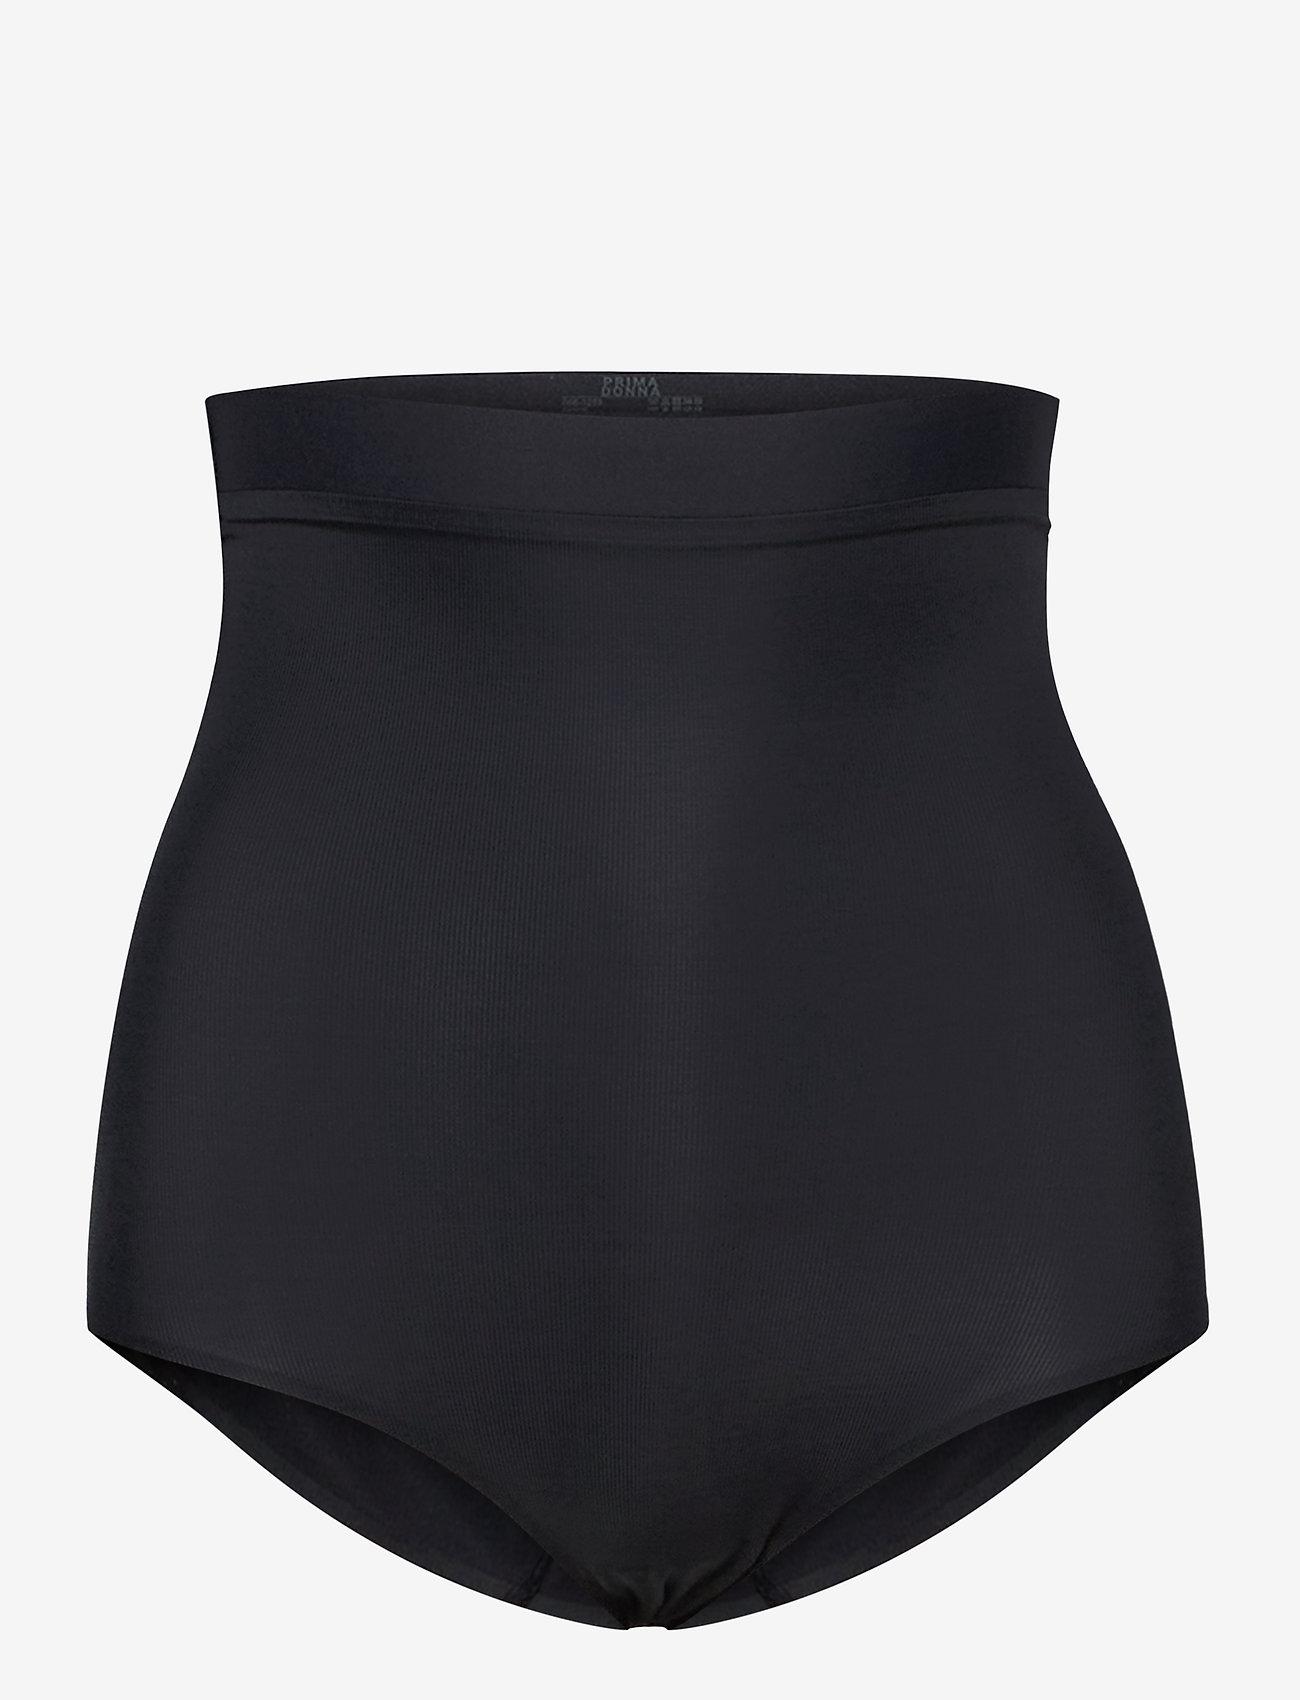 Primadonna - FIGURAS - bottoms - charcoal - 0